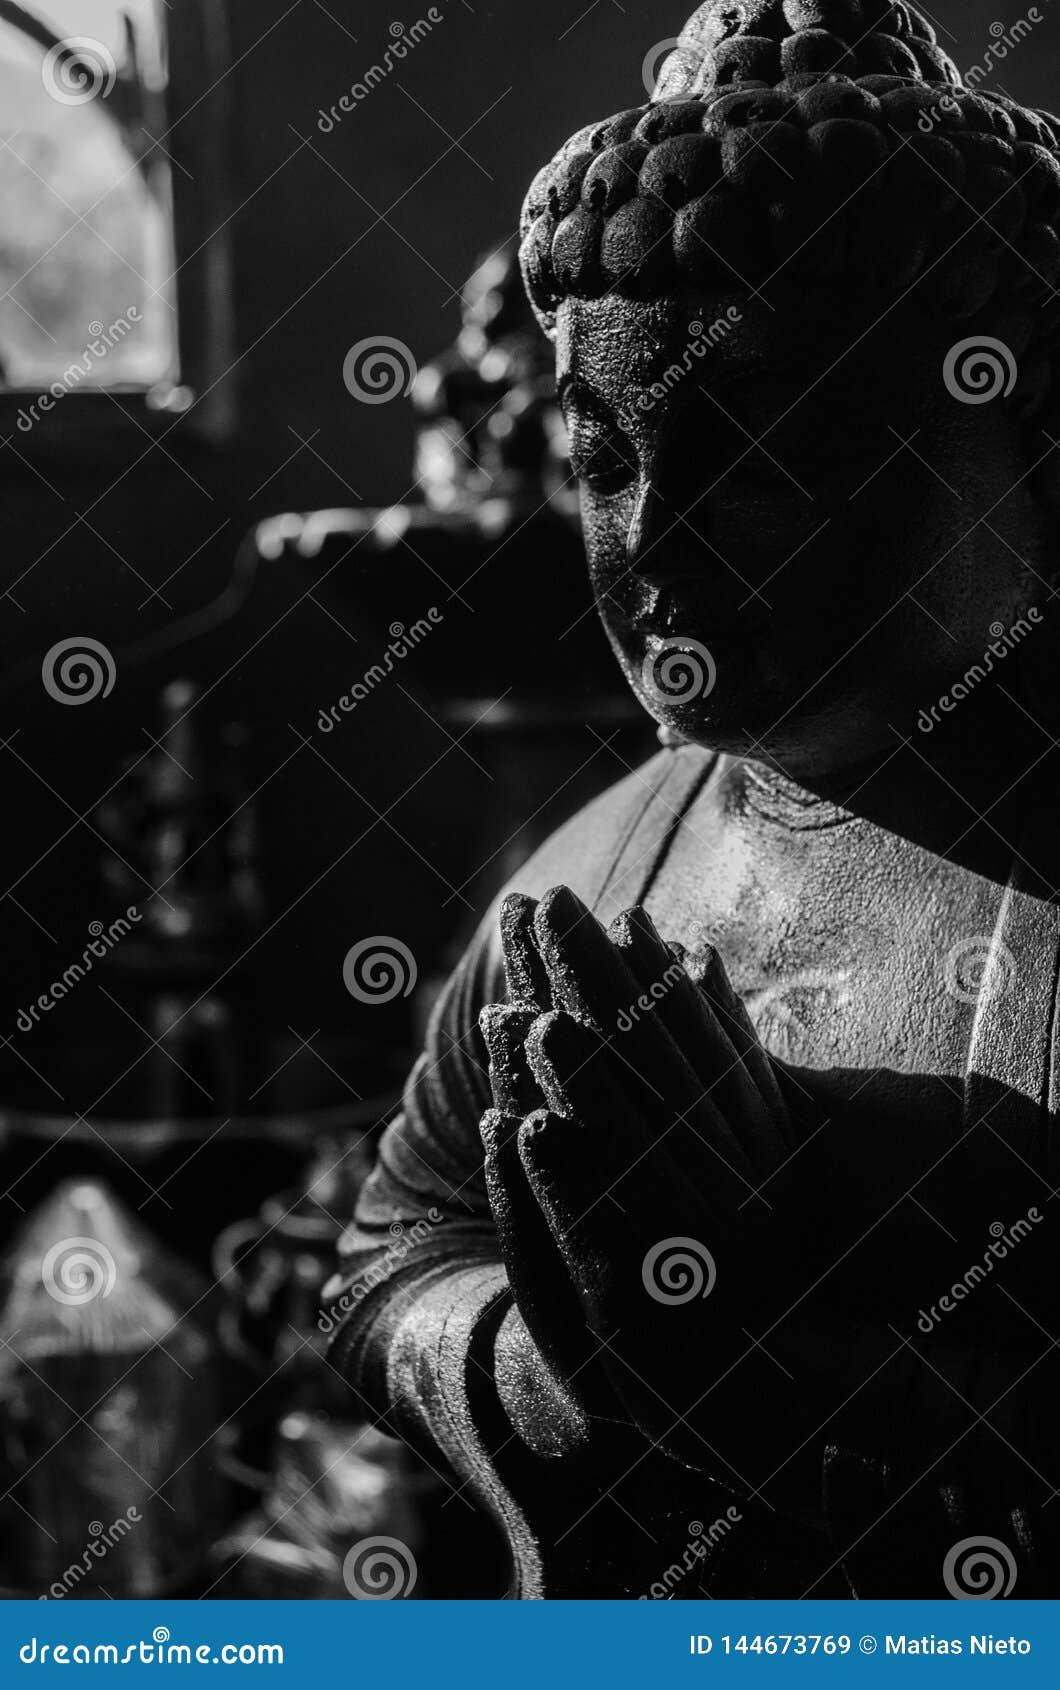 Statua buddista a posizione a distanza in profondità in Argentina